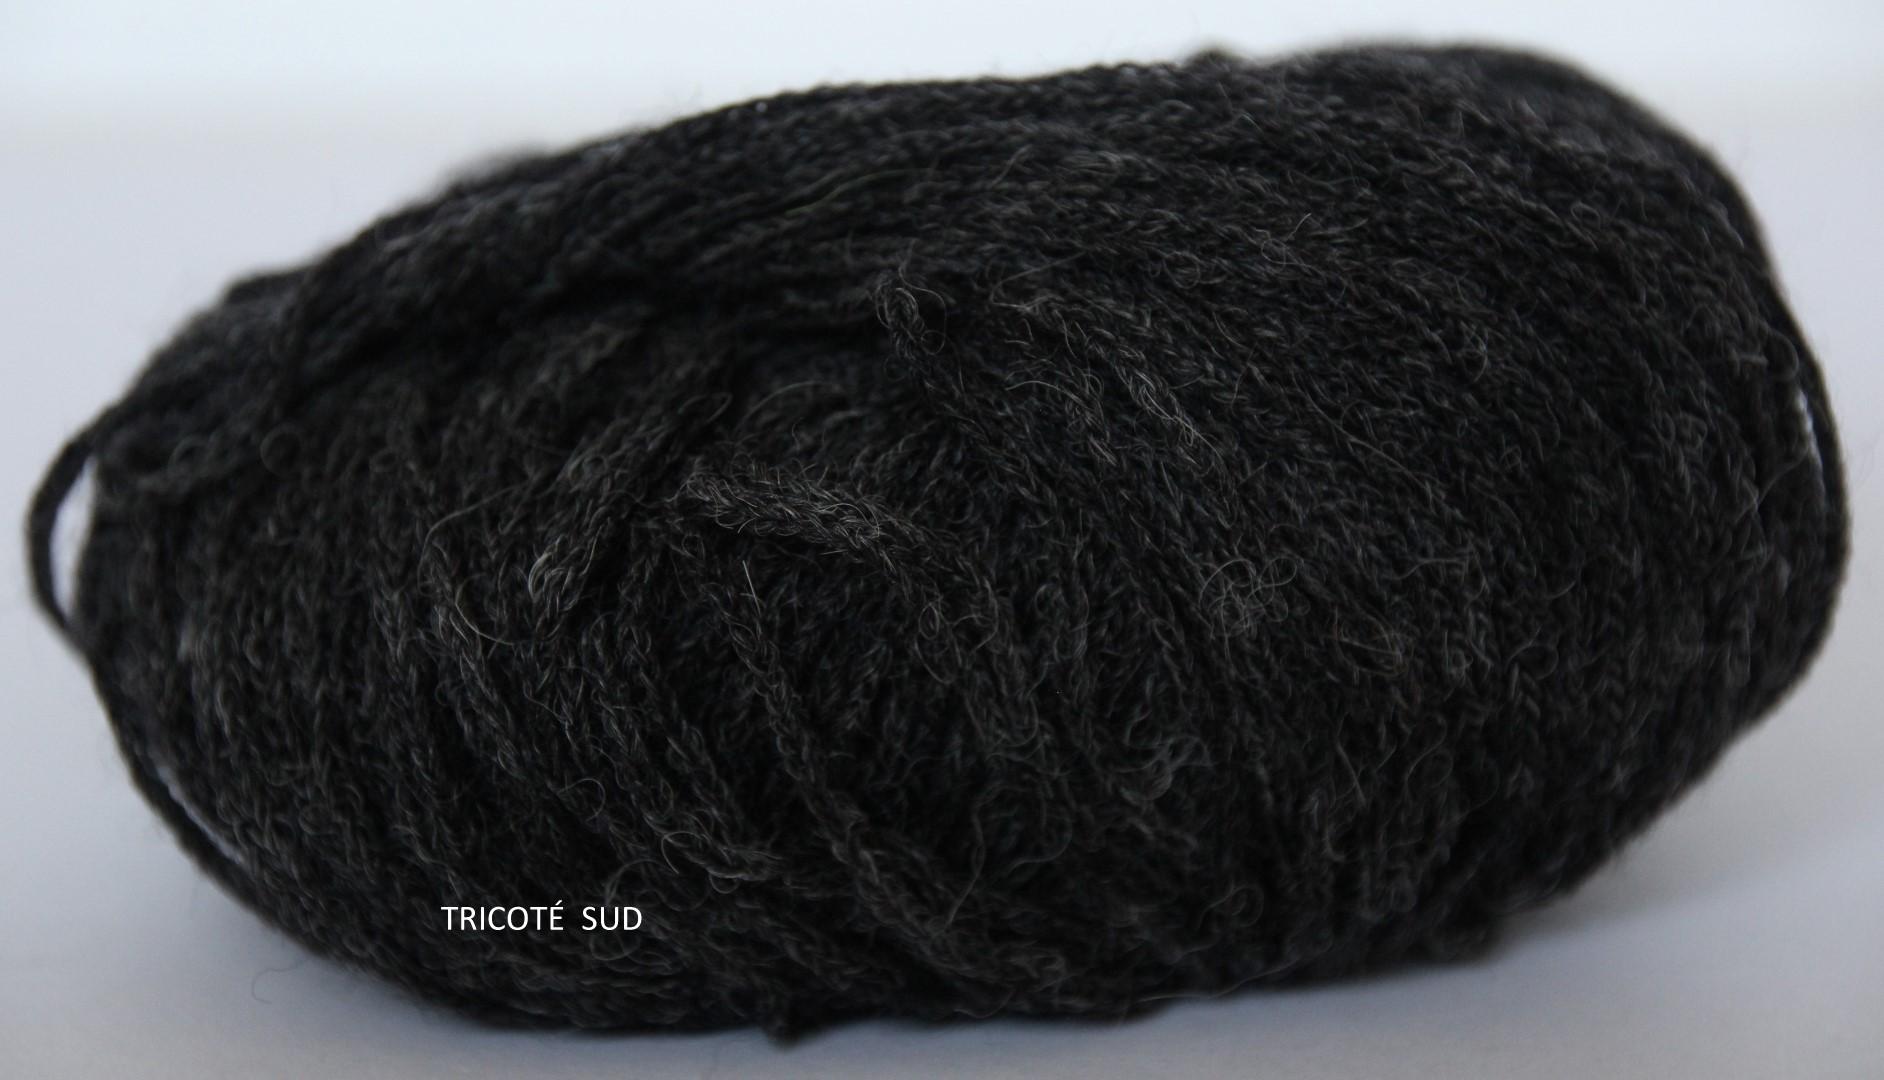 NOVENA COLORIS 70 (2) (Large)